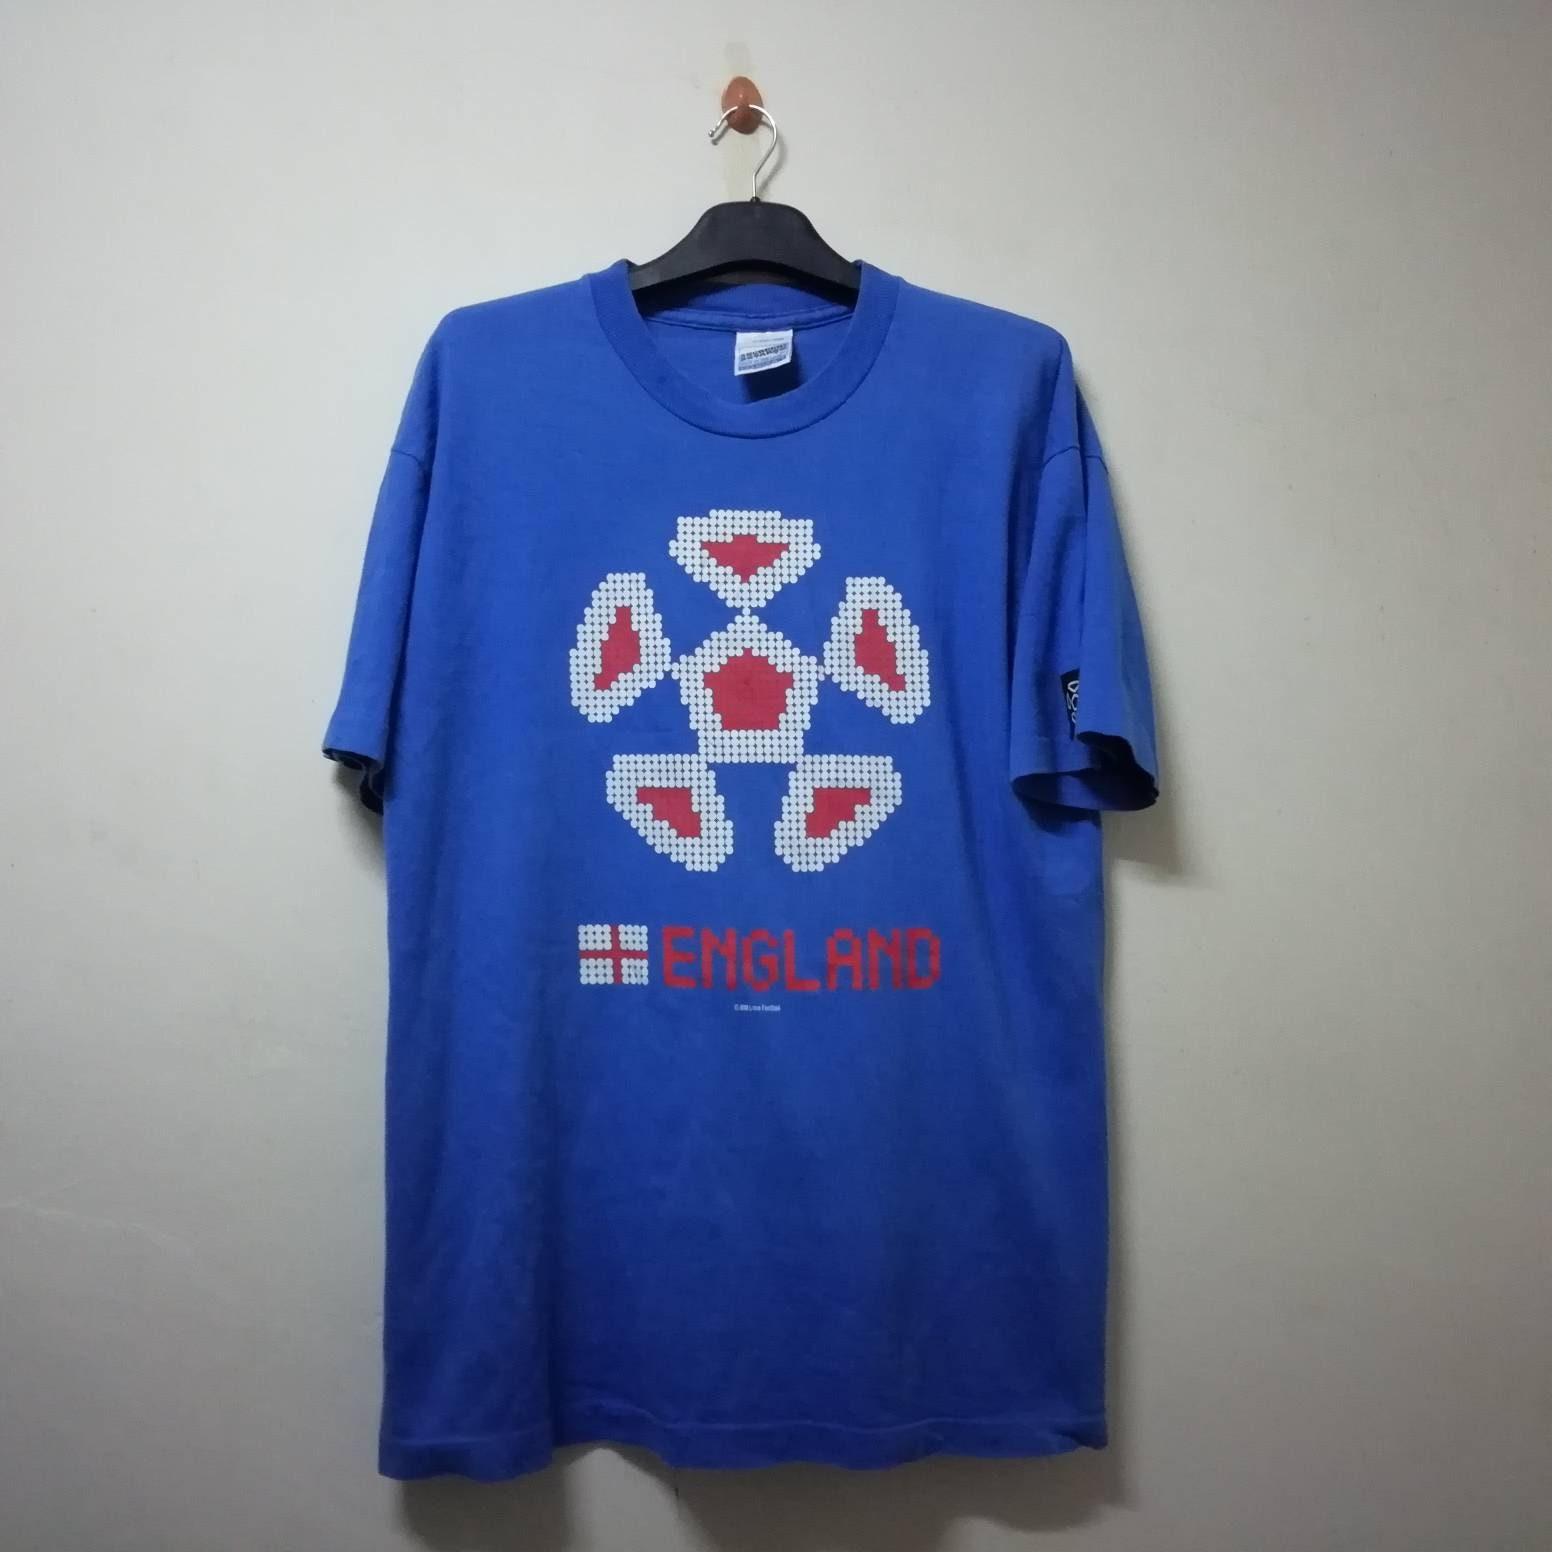 a0c45dae Vintage Football Shirts Uk - DREAMWORKS